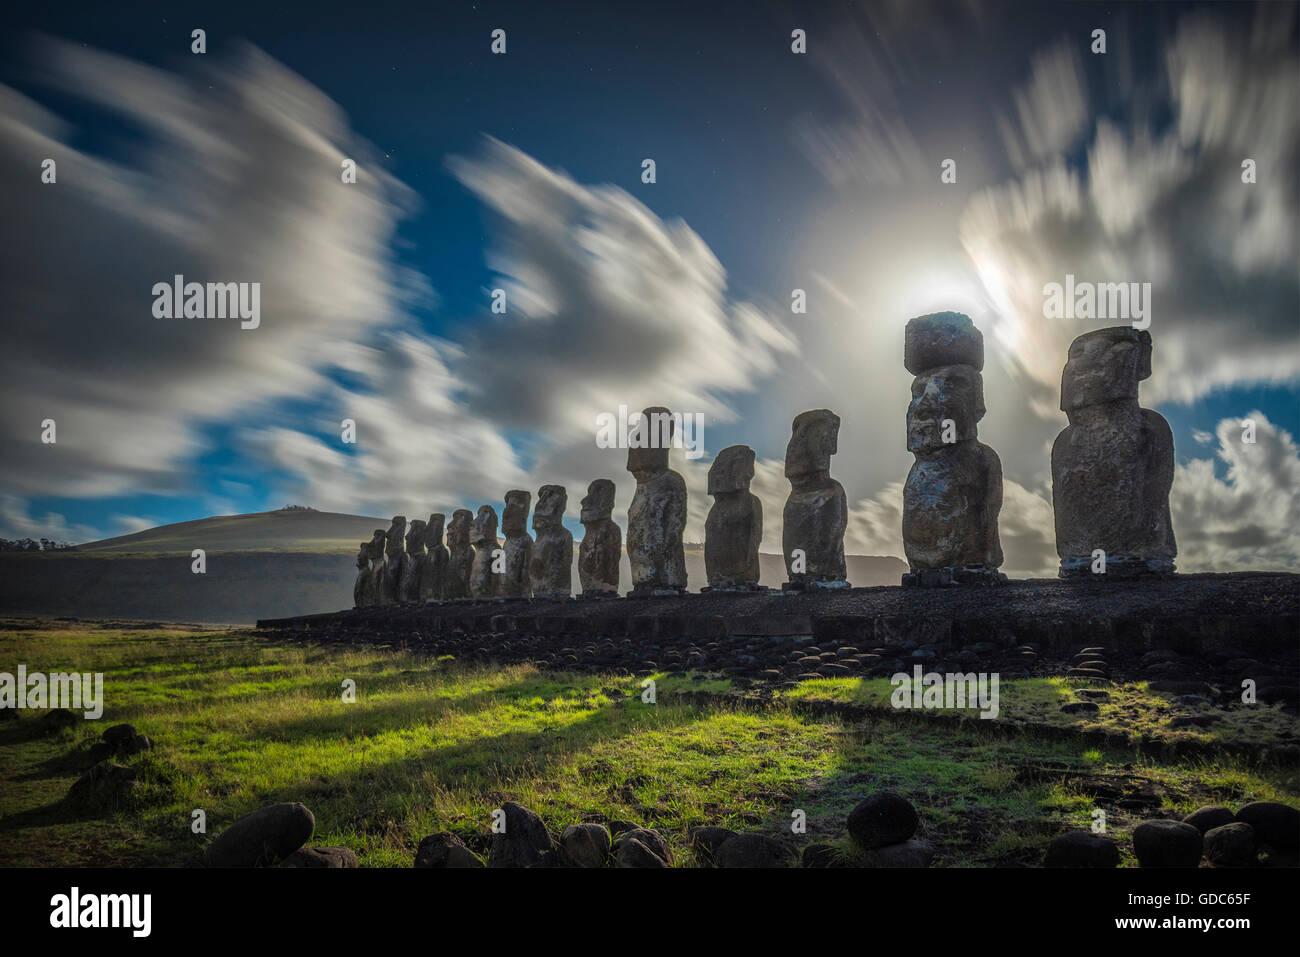 América del Sur, Chile, Isla de Pascua, Rapa Nui, Pacífico Sur,la UNESCO, Patrimonio Mundial, Imagen De Stock